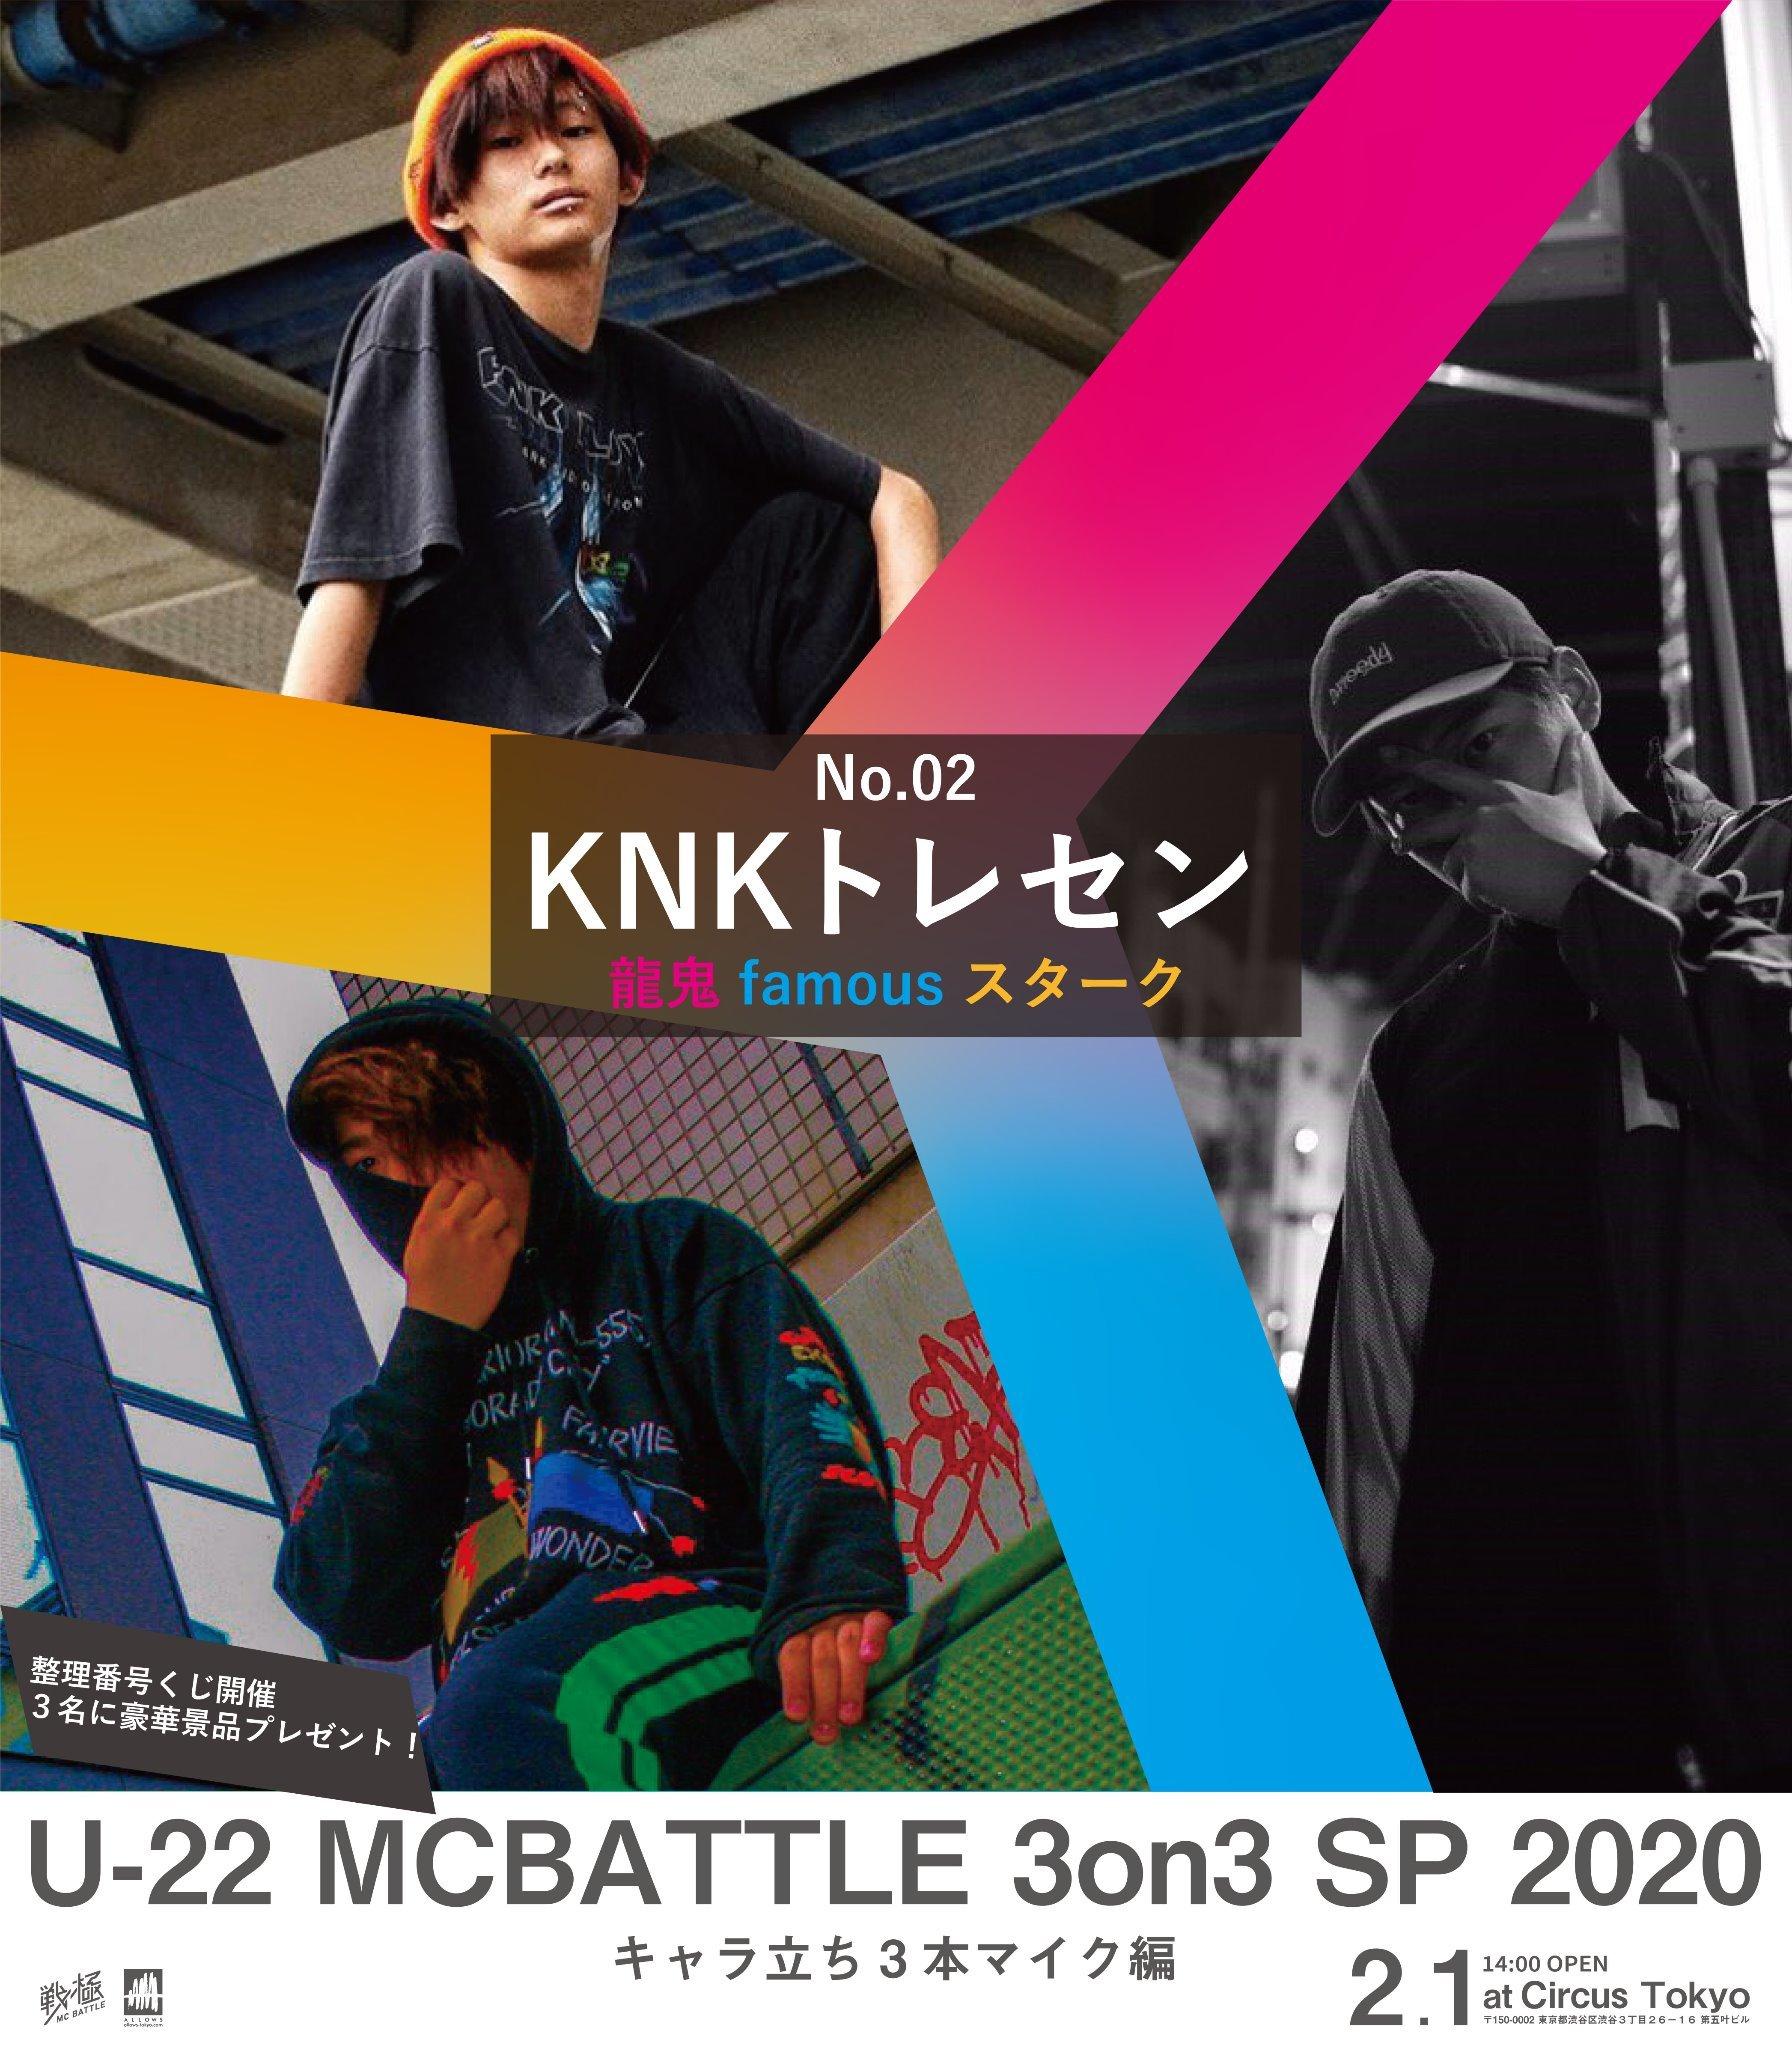 2/1 U-22 MCBATTLE 3on3 SP 2020 チケット販売開始!8チーム中!_e0246863_22305950.jpg